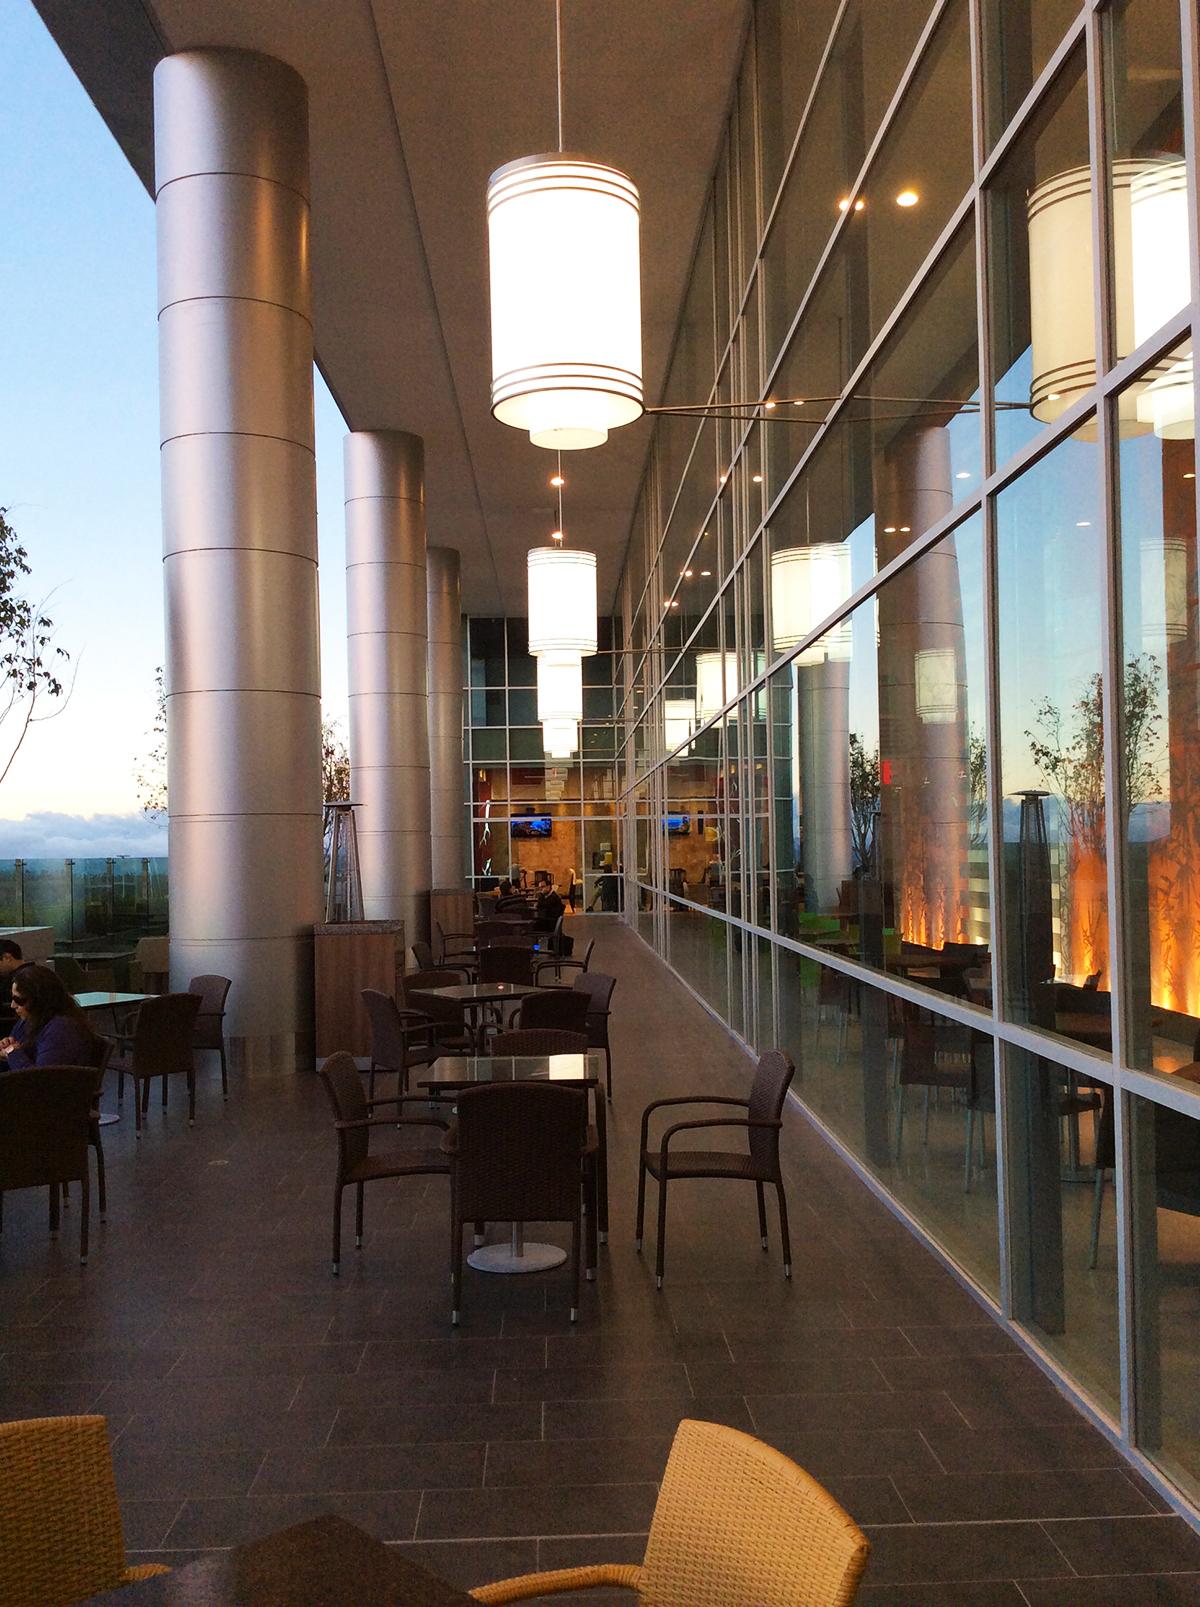 Quito Airport Center Design Architects